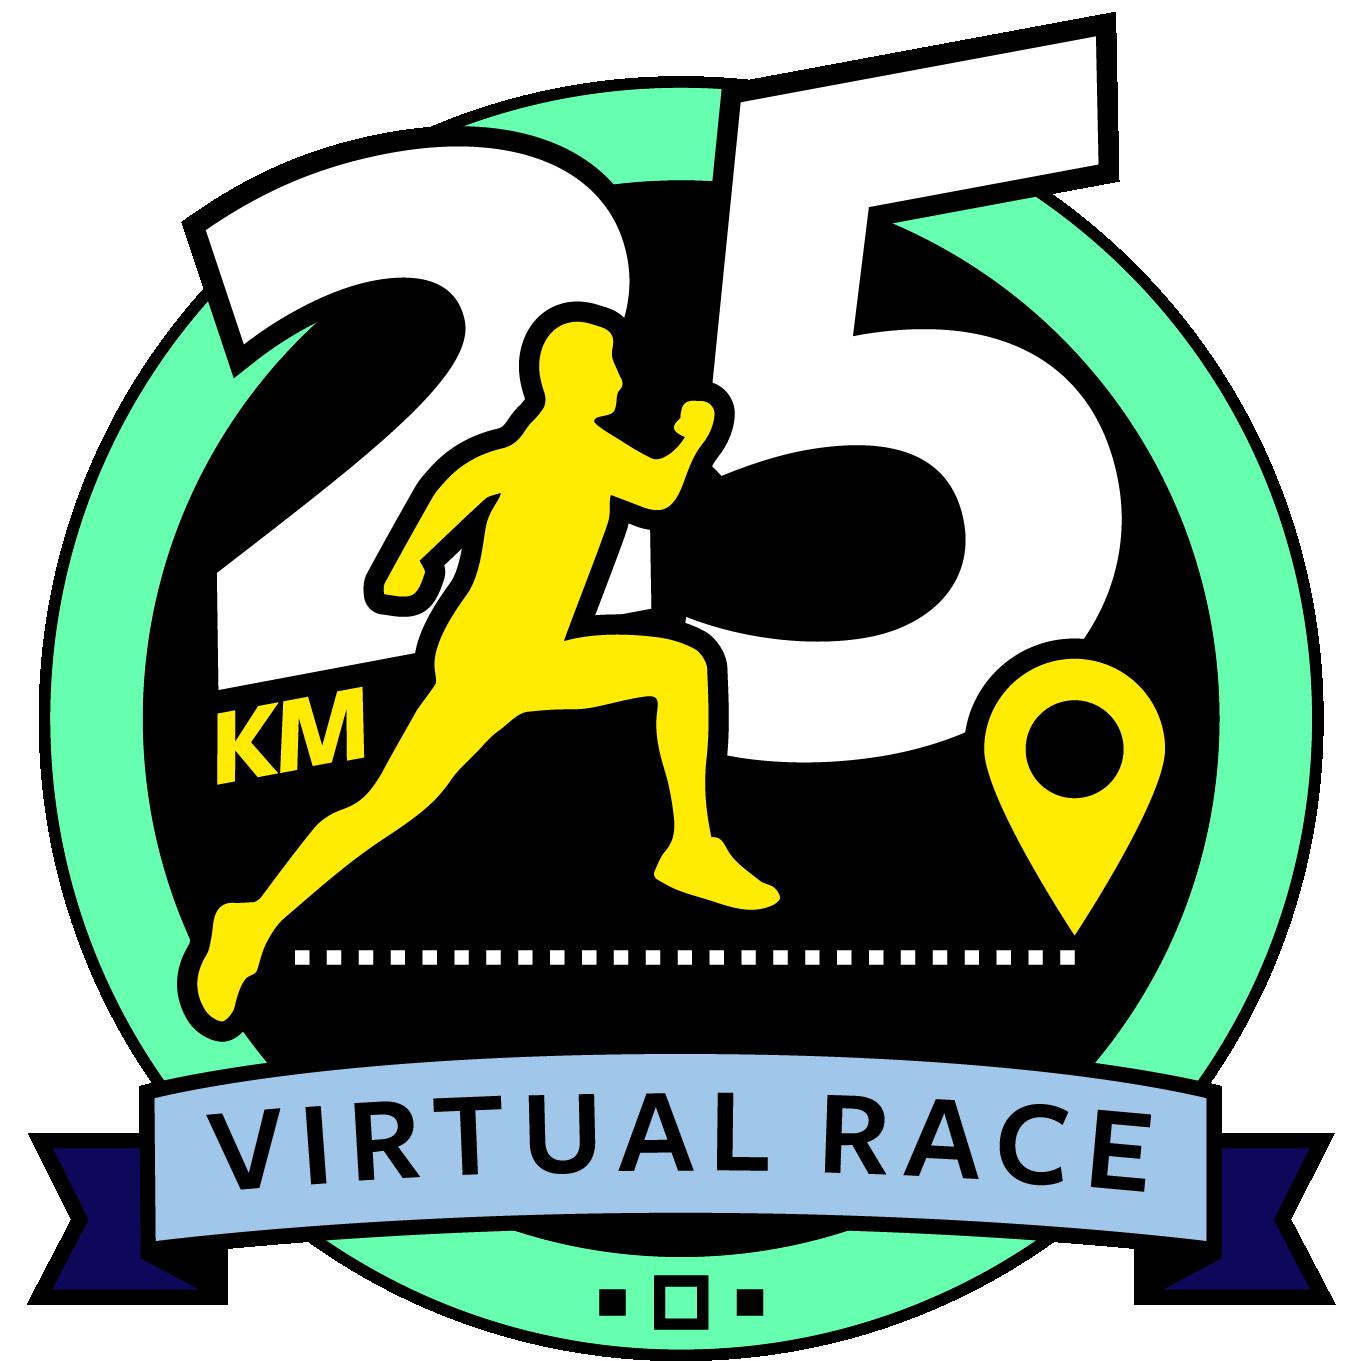 25 kilometer